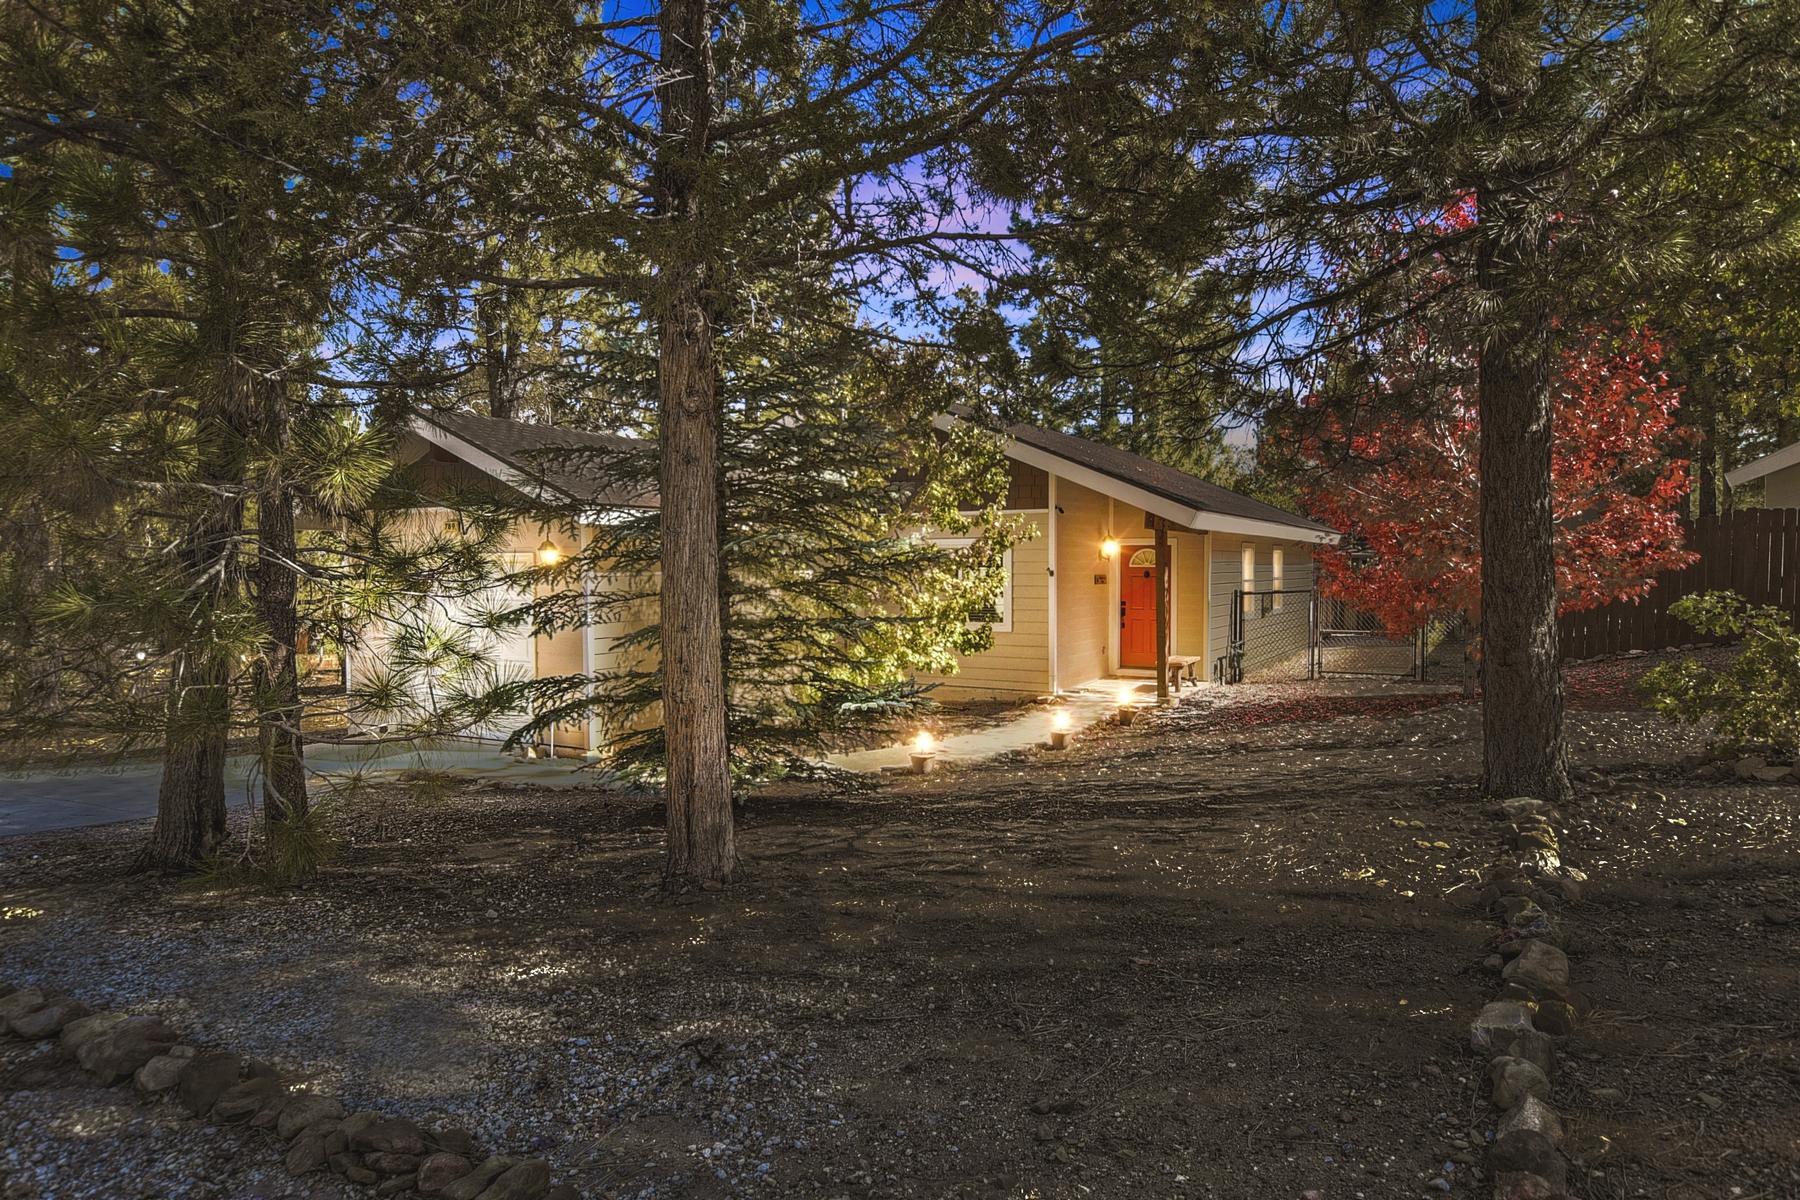 Single Family Homes for Sale at 789 San Bernardino Avenue Sugarloaf, California 92386 789 San Bernardino Avenue Sugarloaf, California 92386 United States